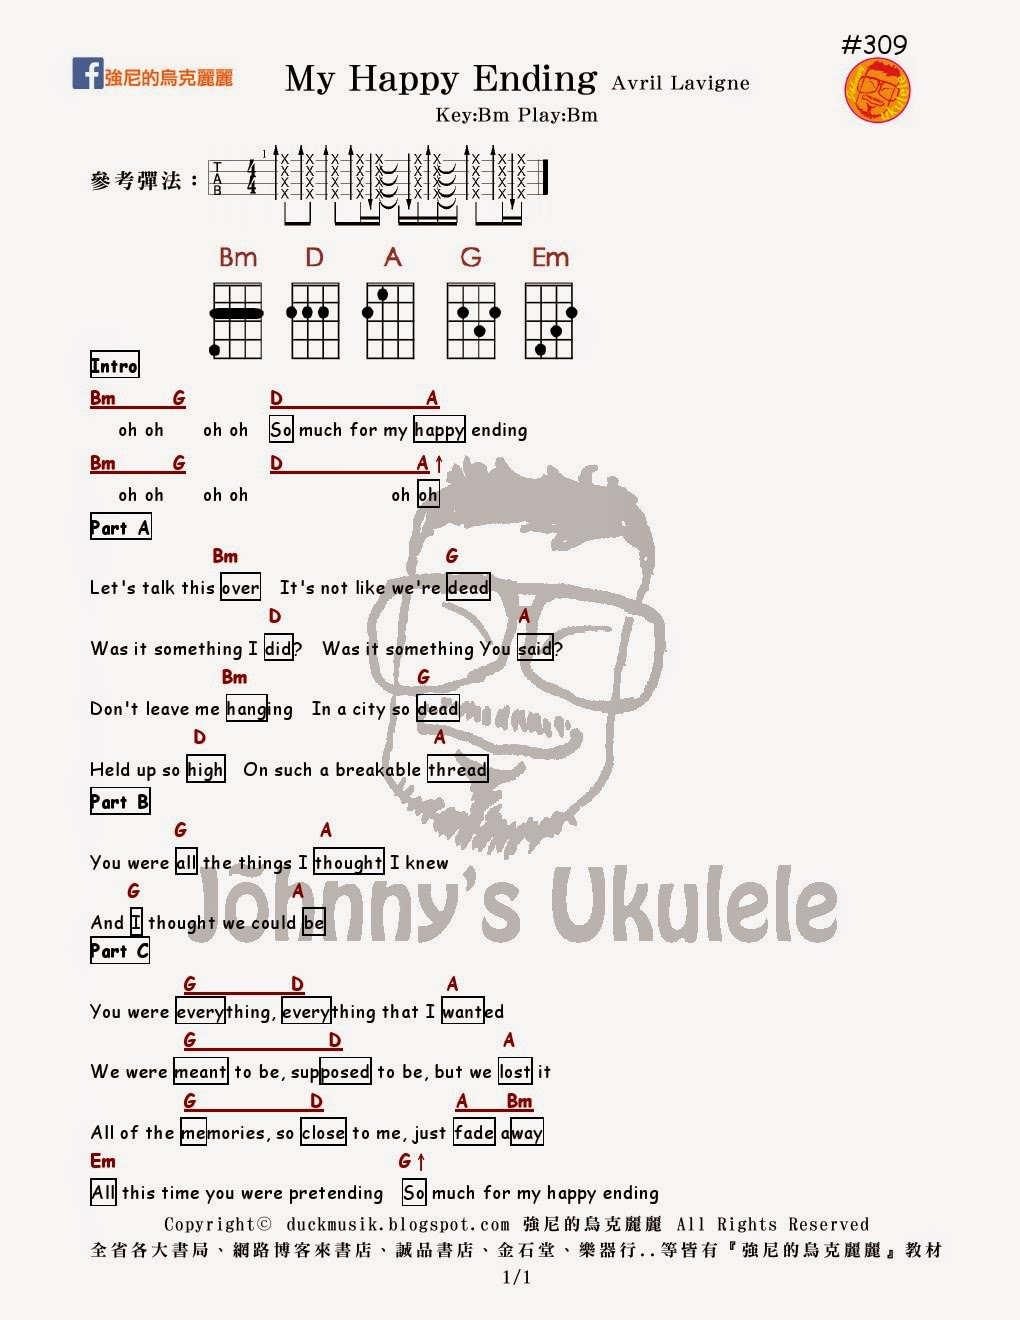 Johnny ukulele 309 my happy ending avril 309 my happy ending avril lavigne johnnys ukulele tabs hexwebz Images